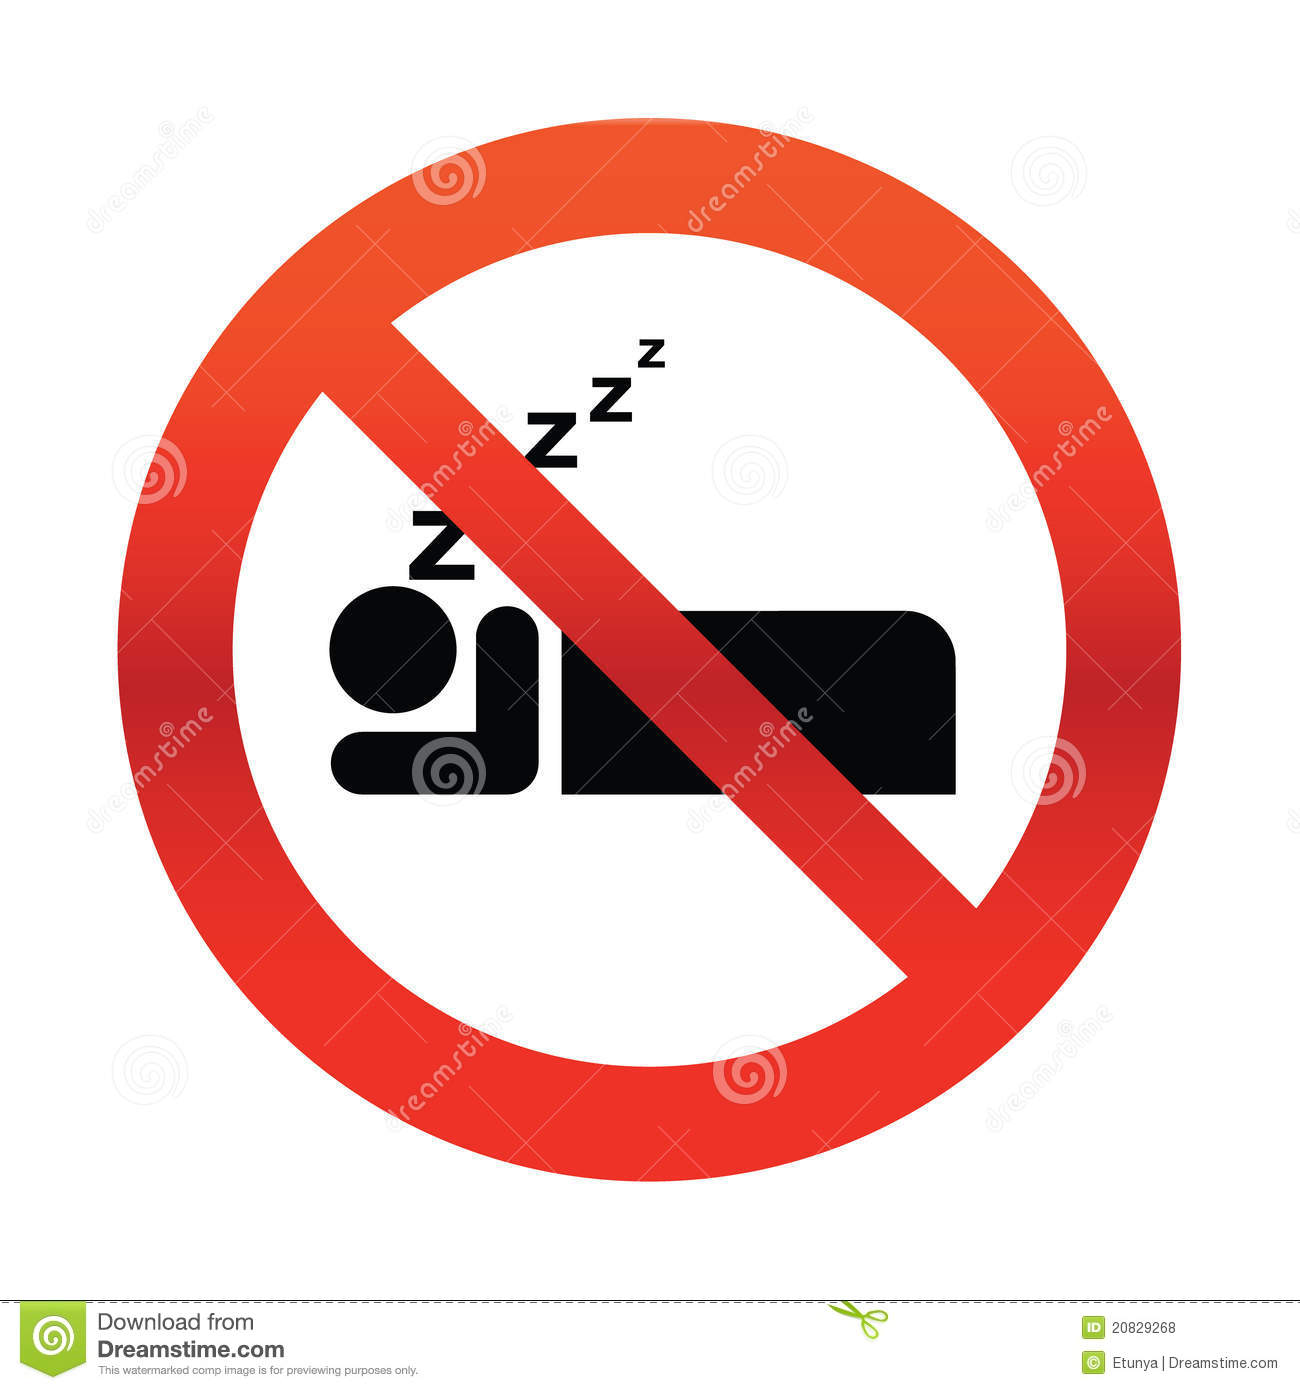 No sleep clipart 5 » Clipart Station.